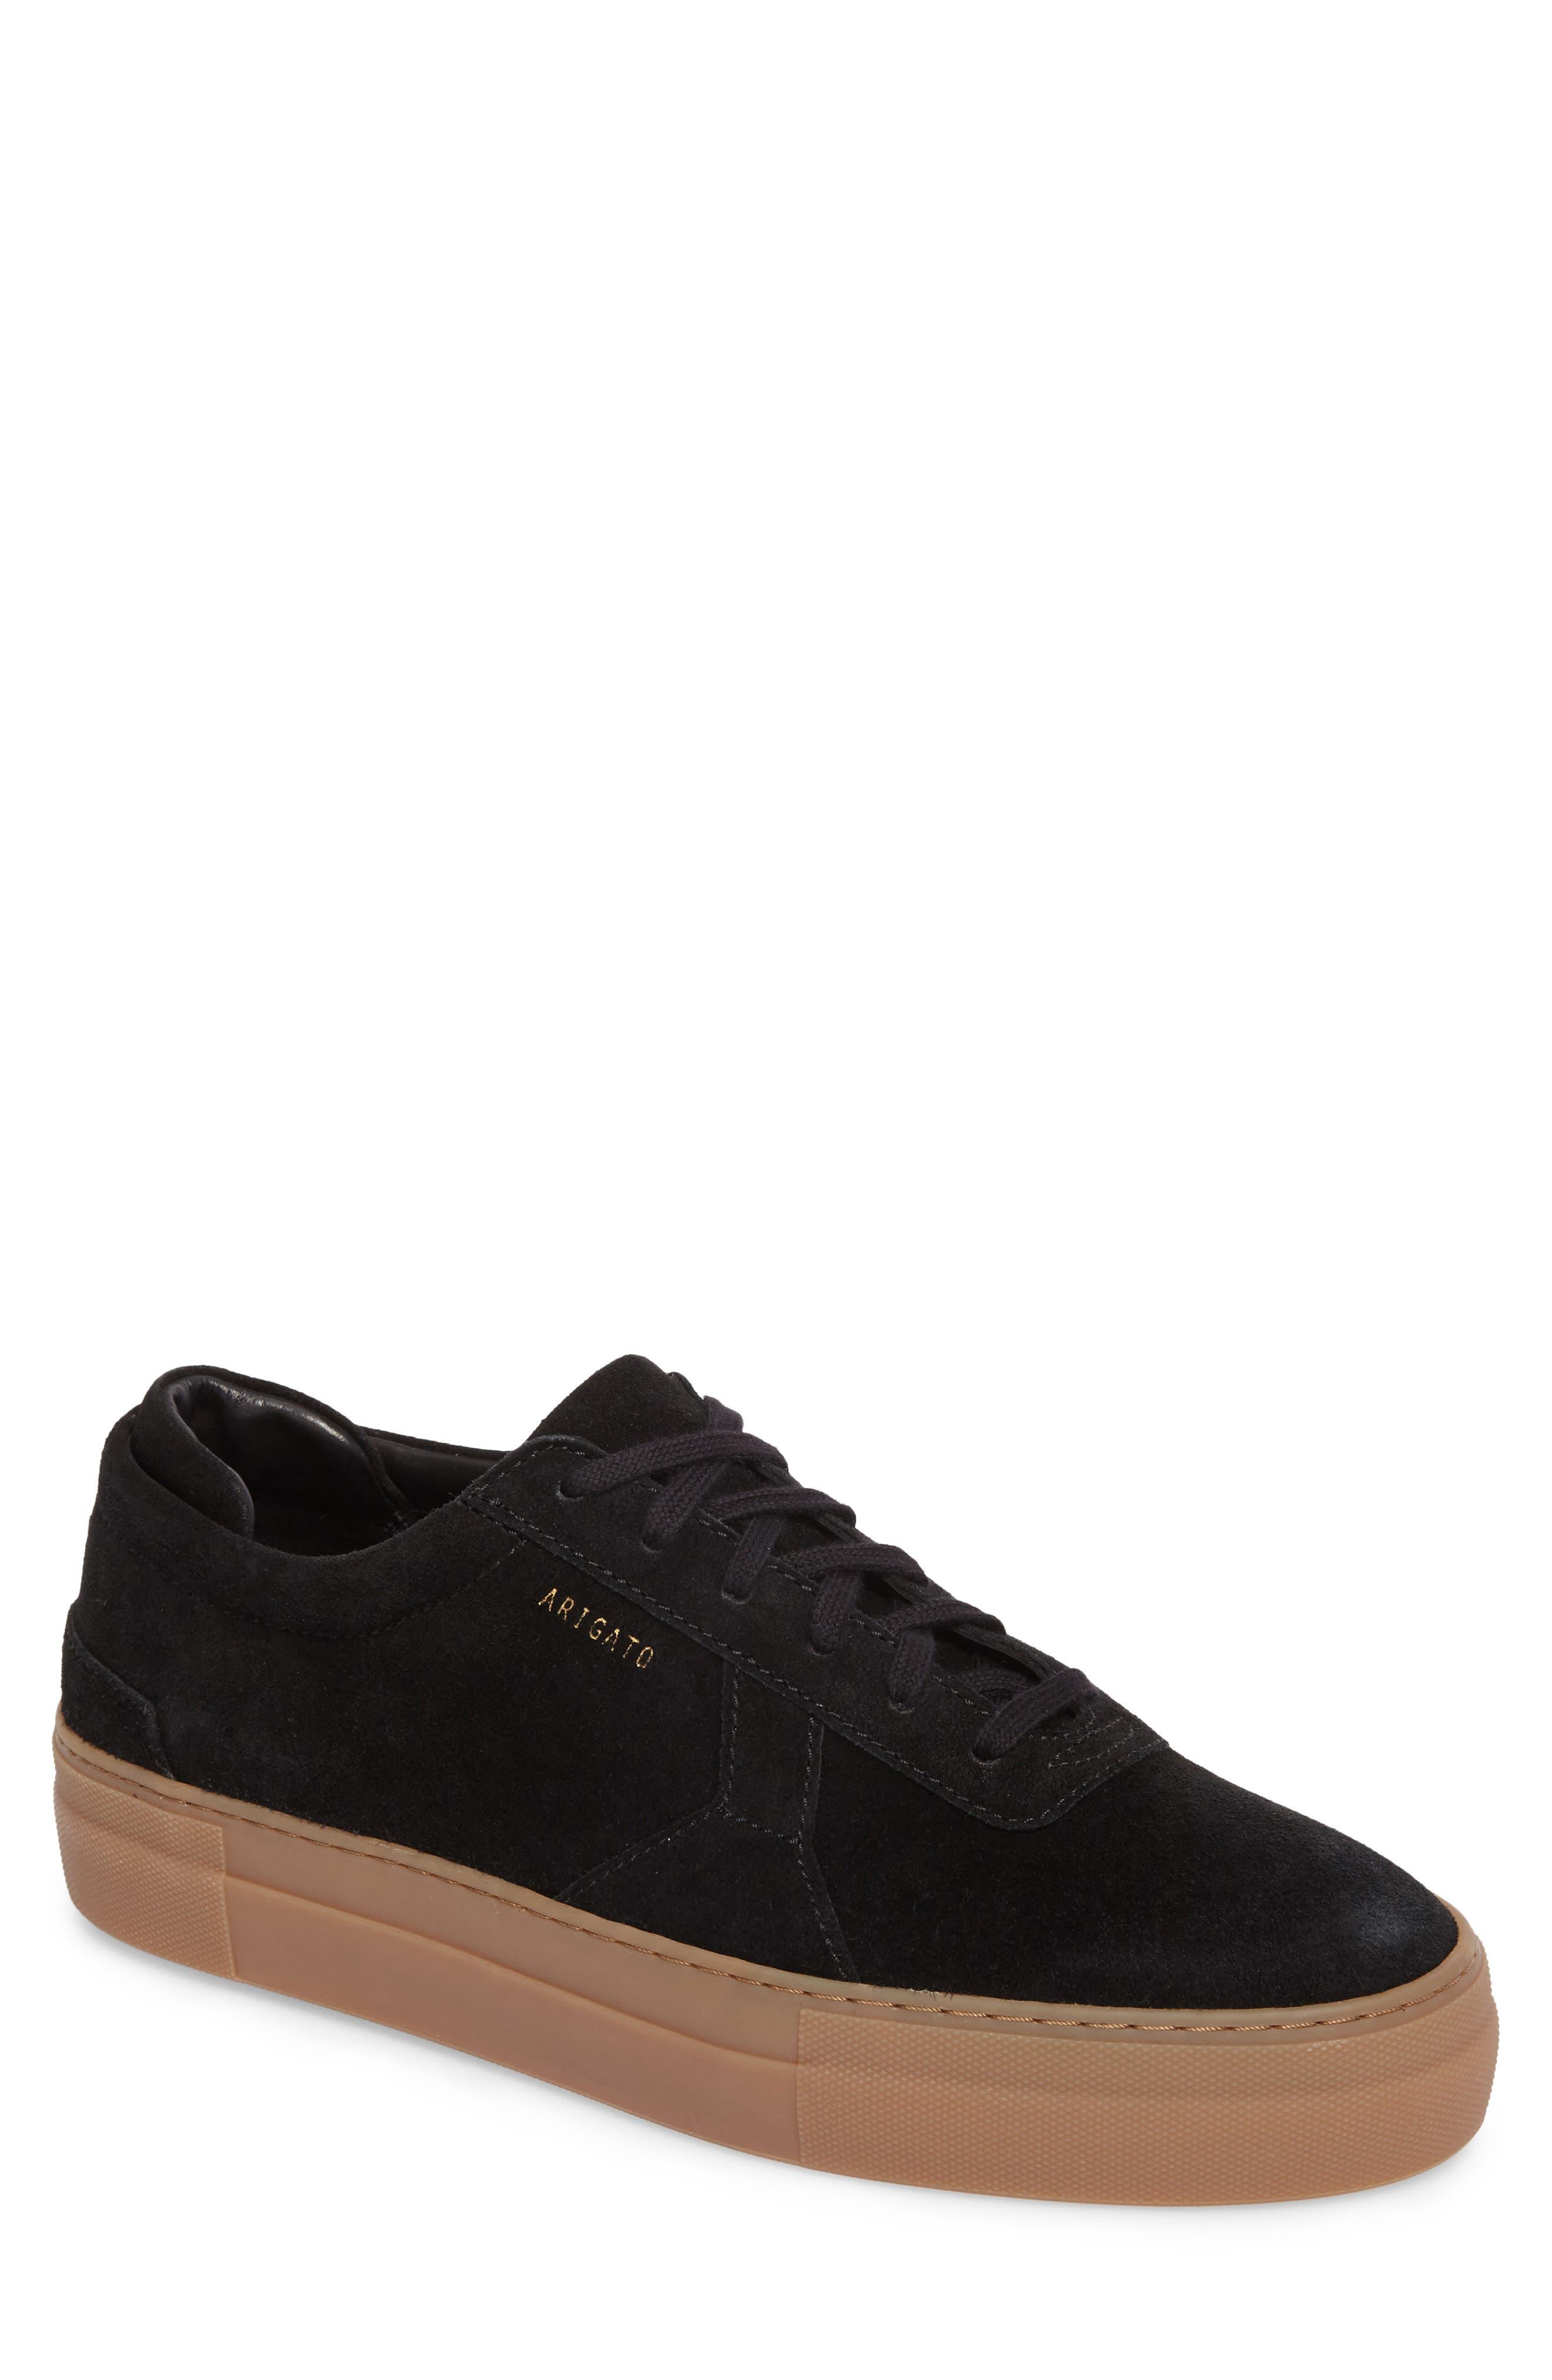 Axel Arigato Platform Sneaker (Men)